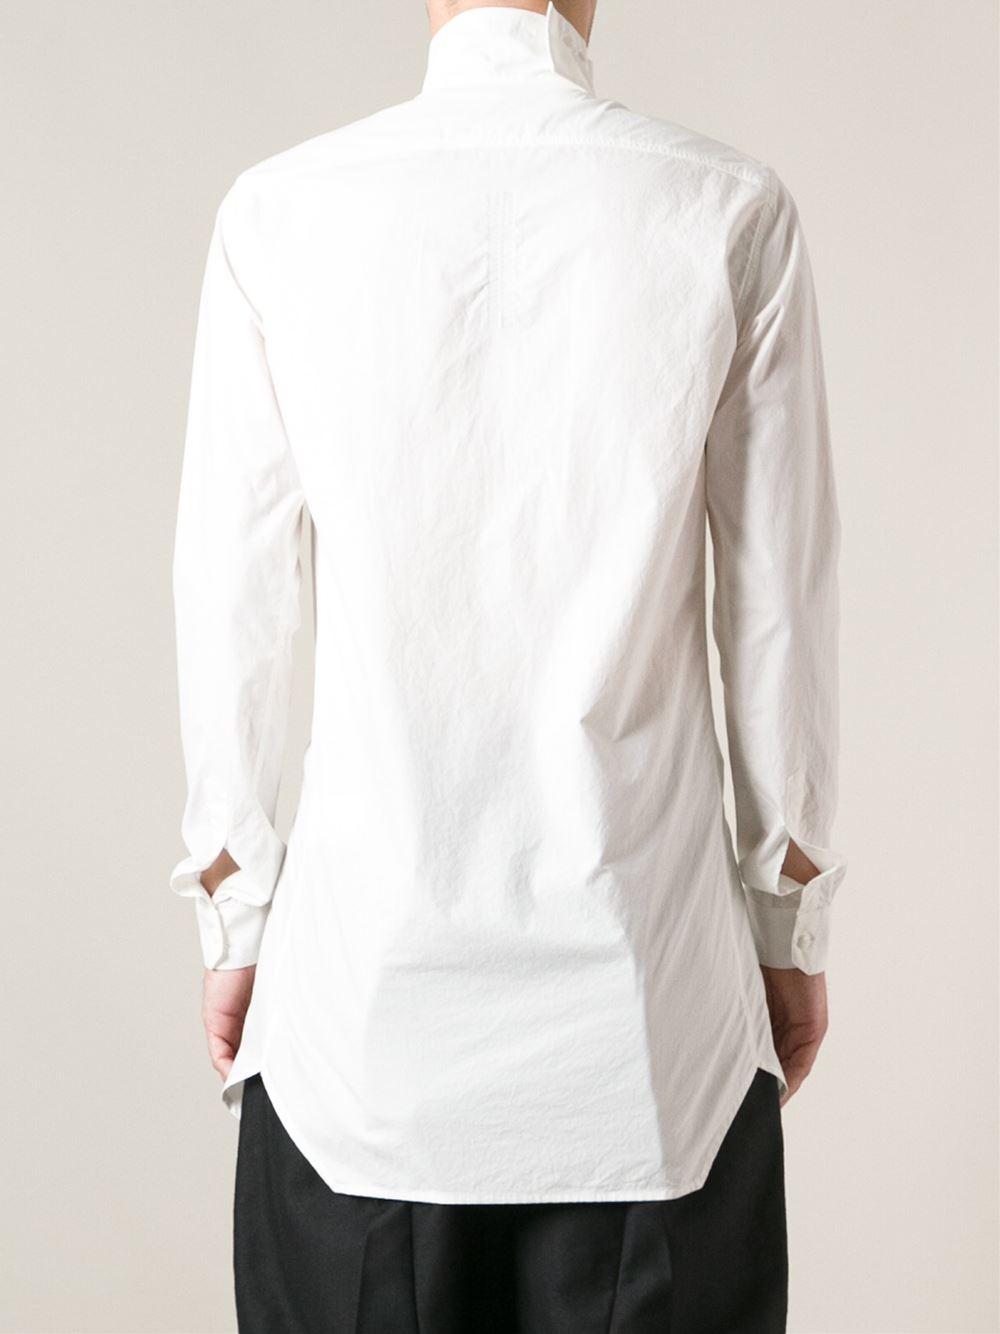 Rick Owens High Collar Shirt In White For Men Lyst